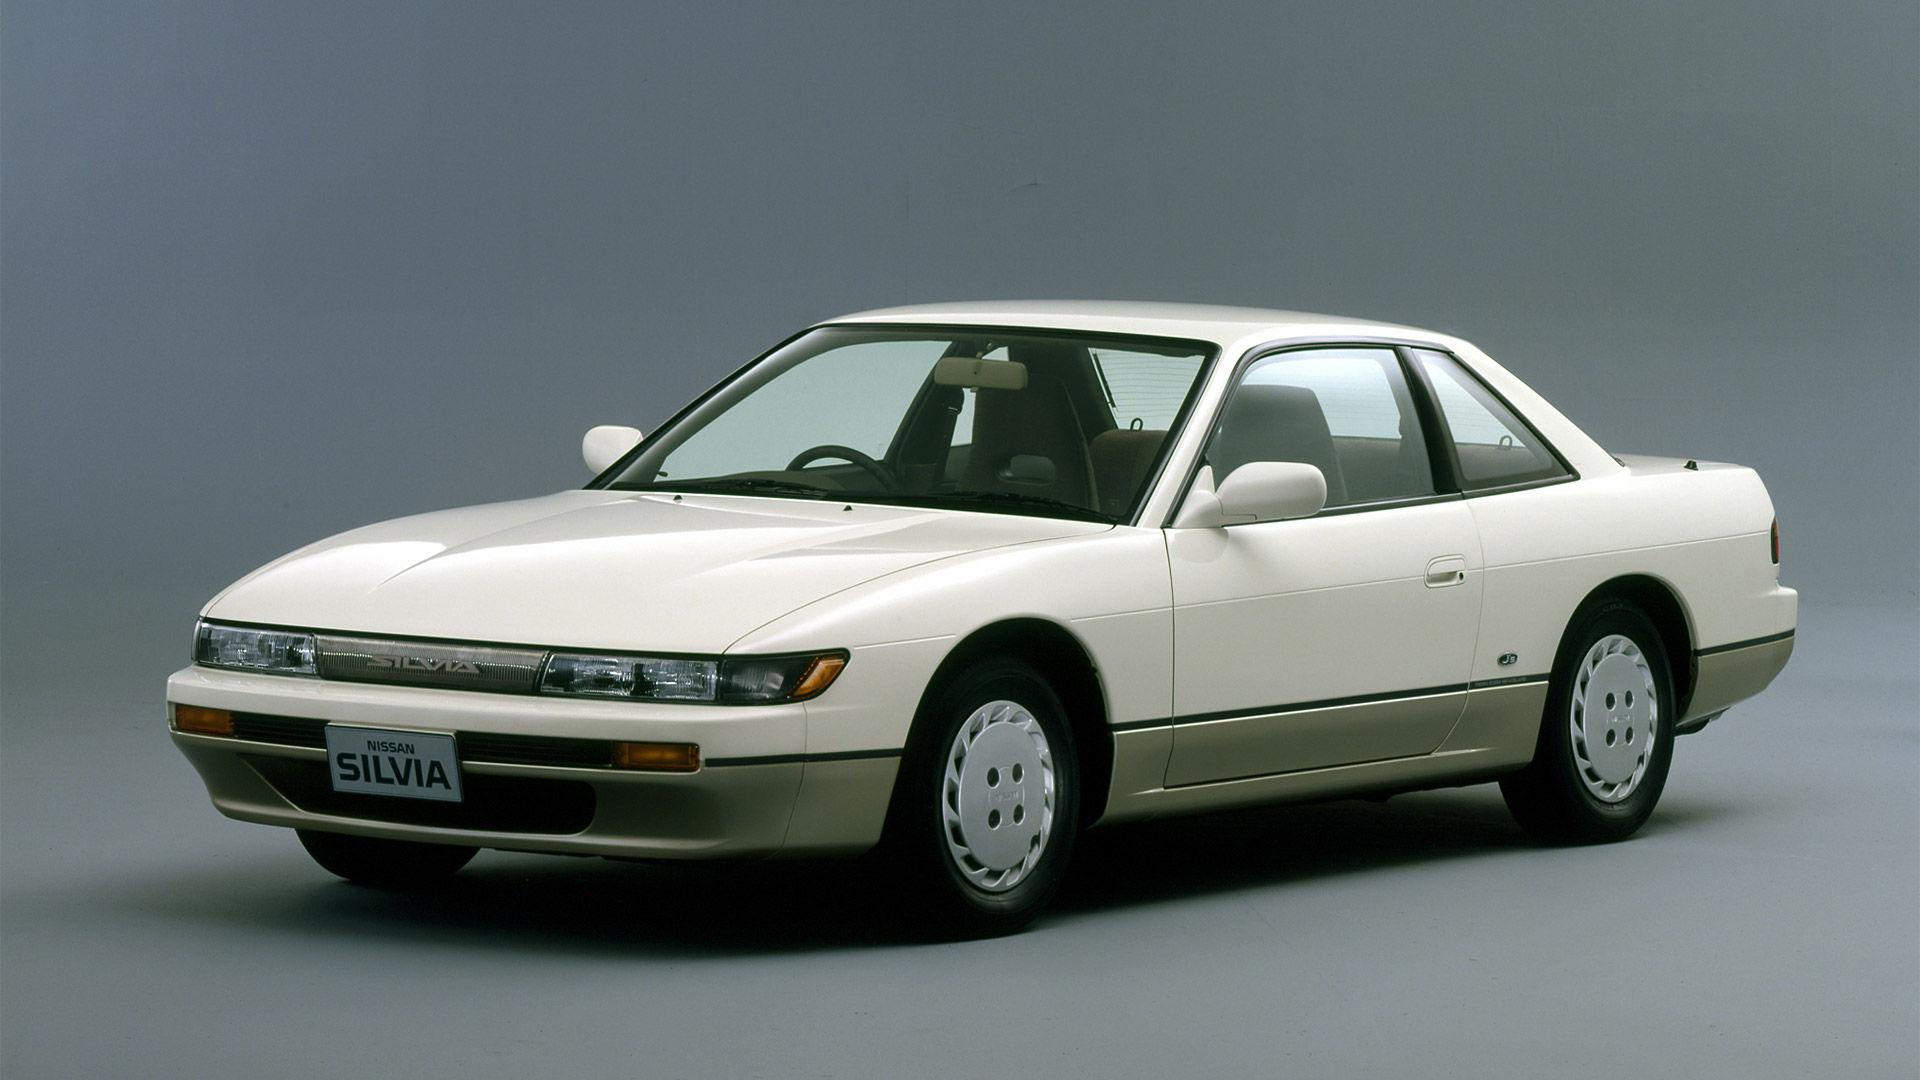 1988 Nissan Silvia